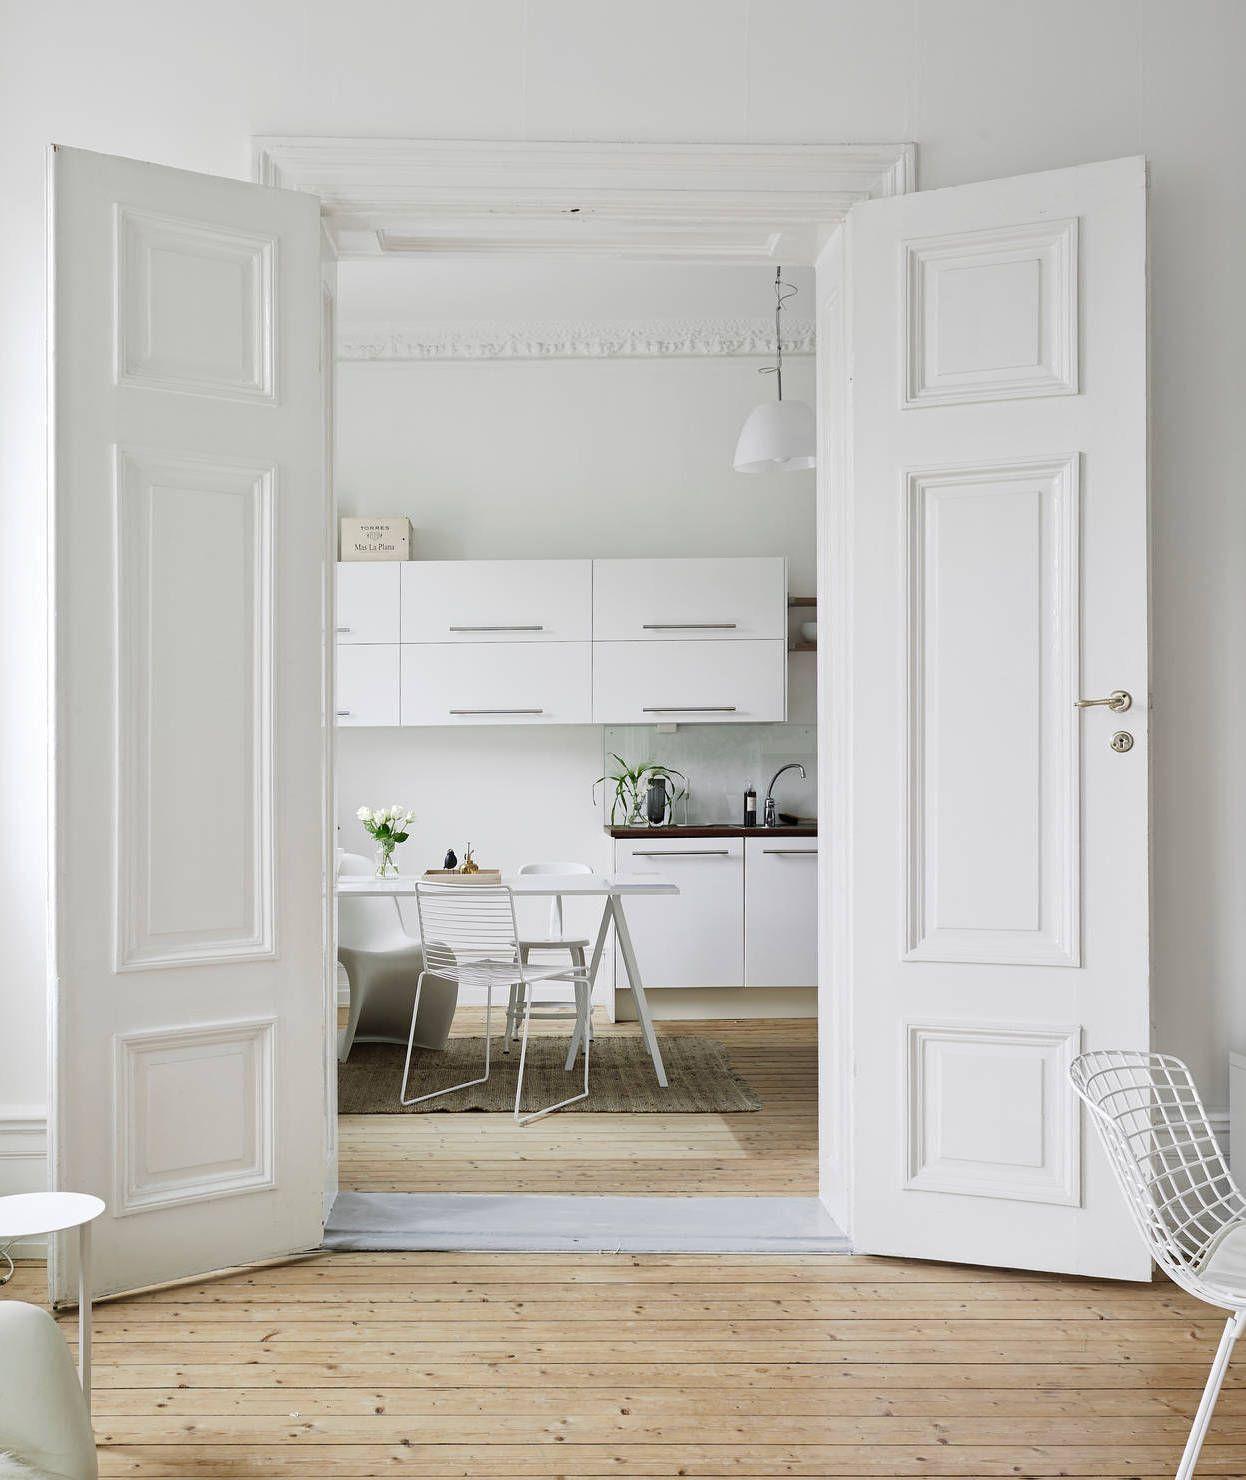 neutrals and clean lines in an old building dielenboden k che und t ren. Black Bedroom Furniture Sets. Home Design Ideas